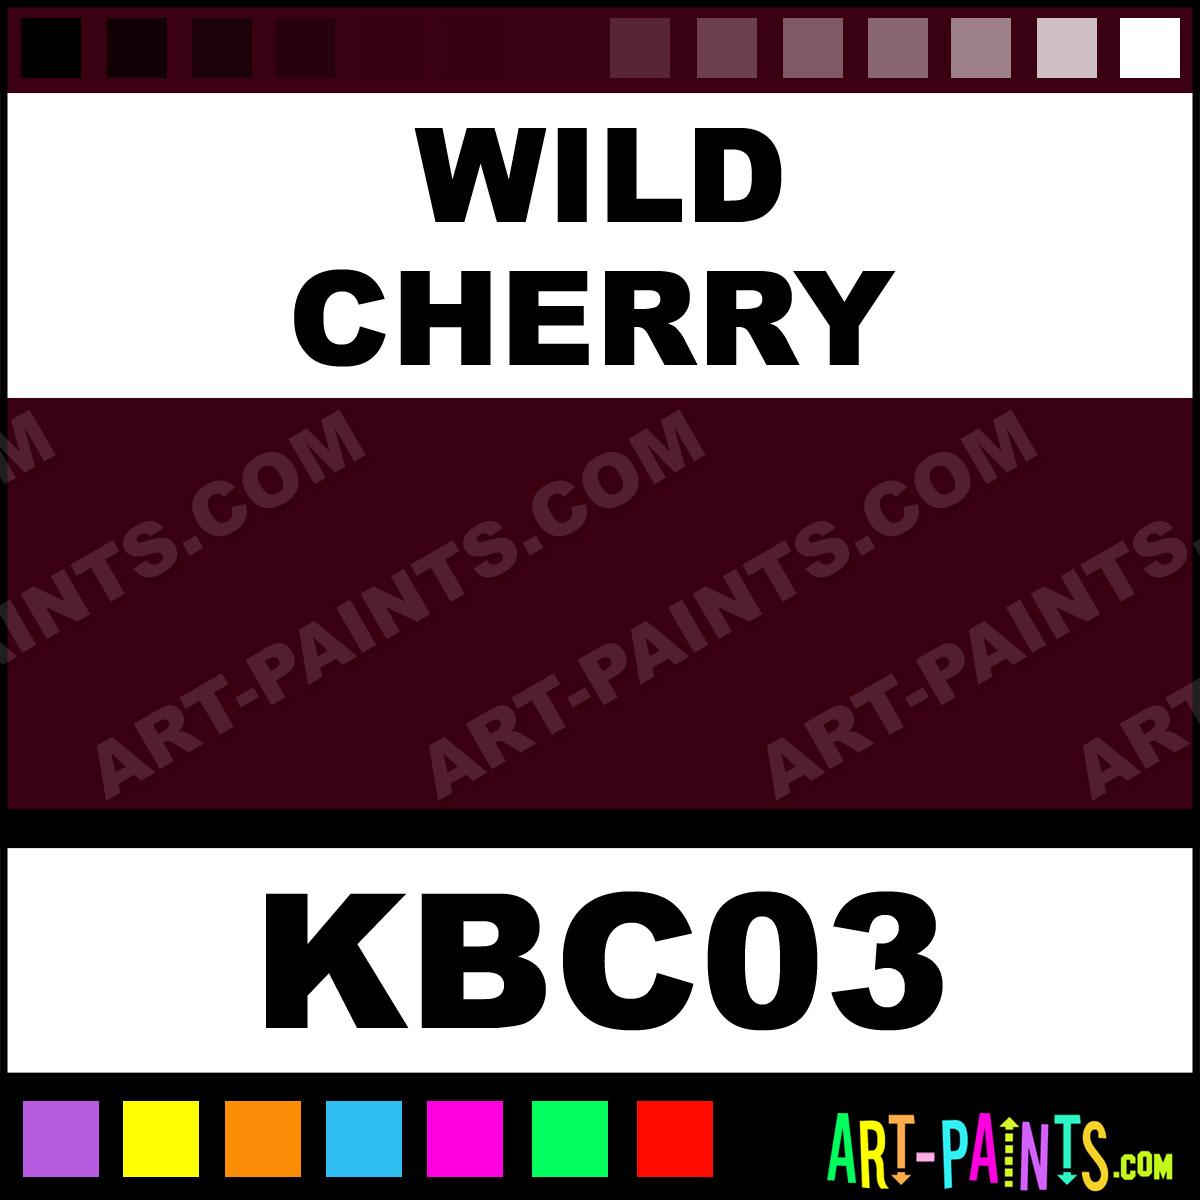 Wild Cherry Kandy Basecoats Airbrush Spray Paints Kbc03